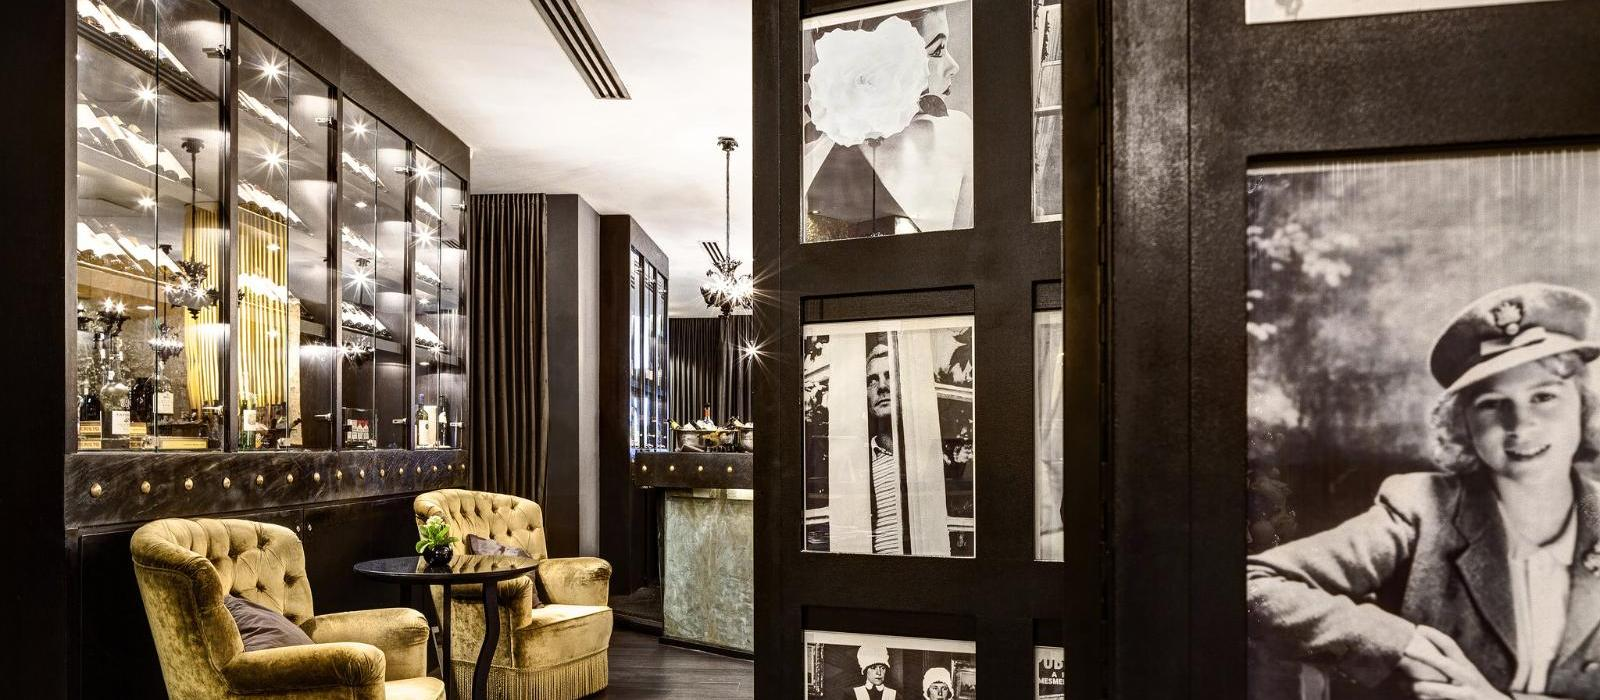 伦敦巴廖尼酒店(Baglioni Hotel London) 酒吧图片  www.lhw.cn